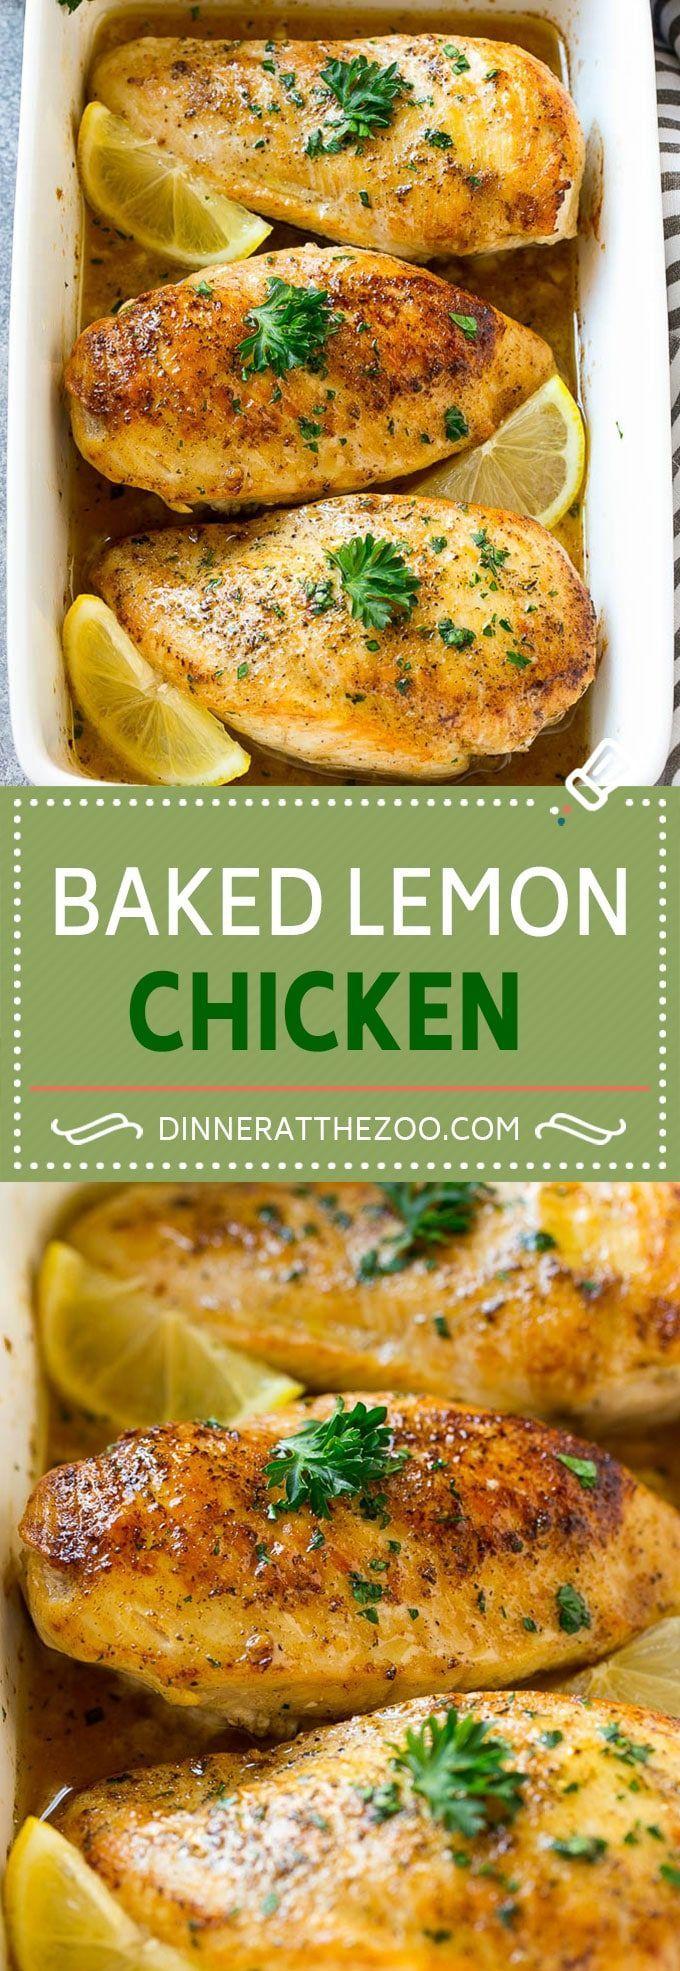 Baked+Lemon+Chicken+Recipe+|+Baked+Chicken+Breasts+|+Lemon+Chicken+Recipe+|+Easy+Chicken+Recipe